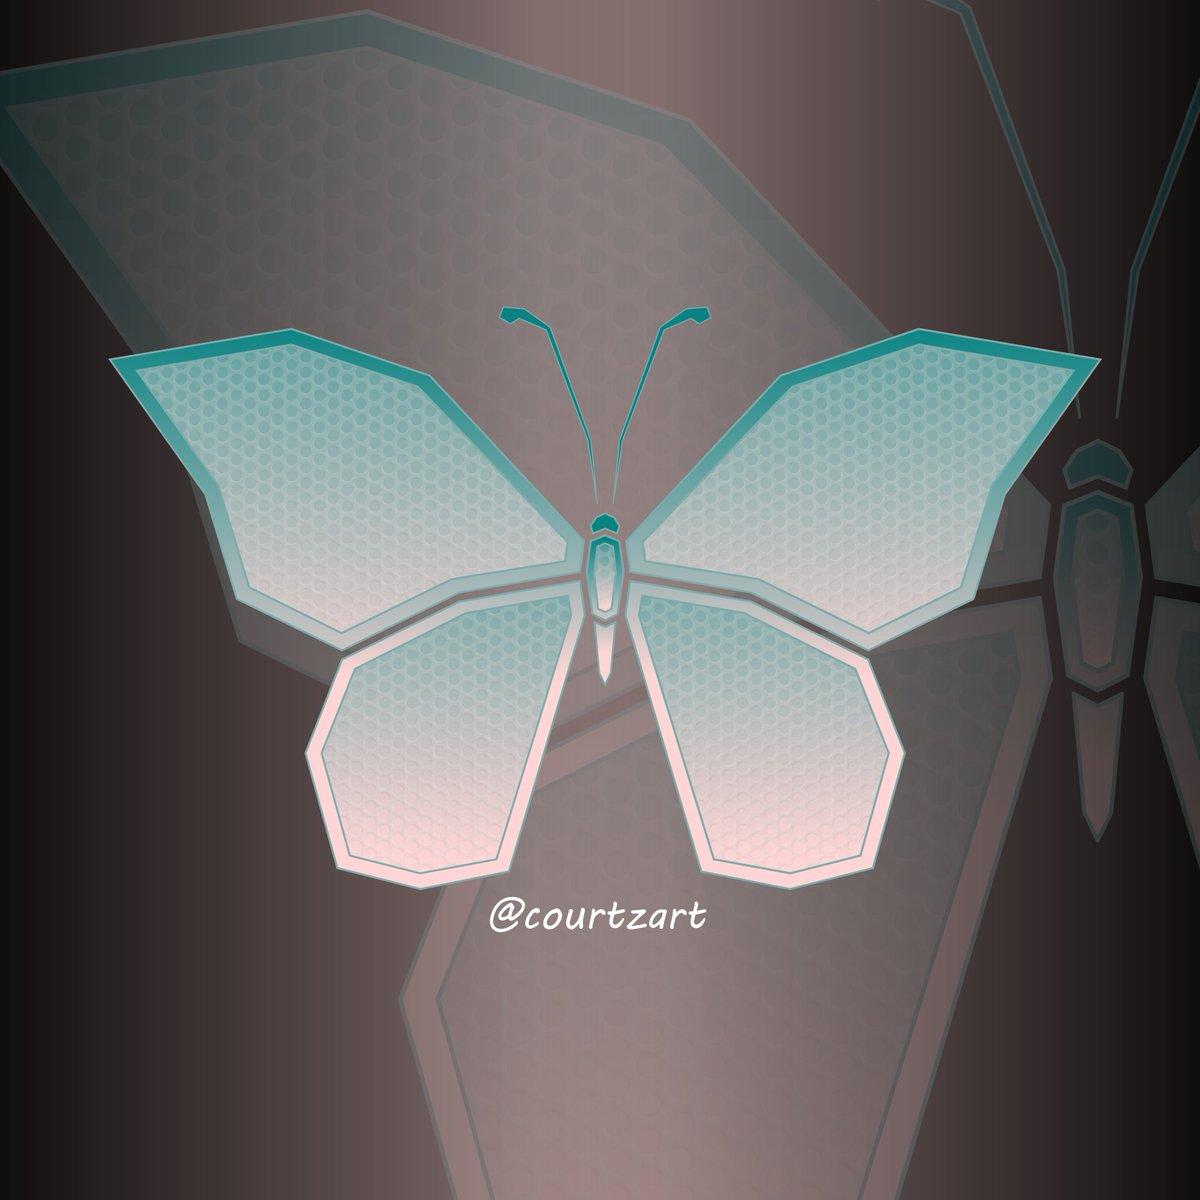 🦋🦋🦋 #butterfly #illustration #Illustrator #art #artist #artistsontwitter #artistsoninstagram #bug #insect #GraphicDesign #GraphicDesigner #vector #vectorart #artistforhire #shapes #digital #digitalart #digitalartist #digitalillustration #graphicart https://t.co/2TasqVm31E